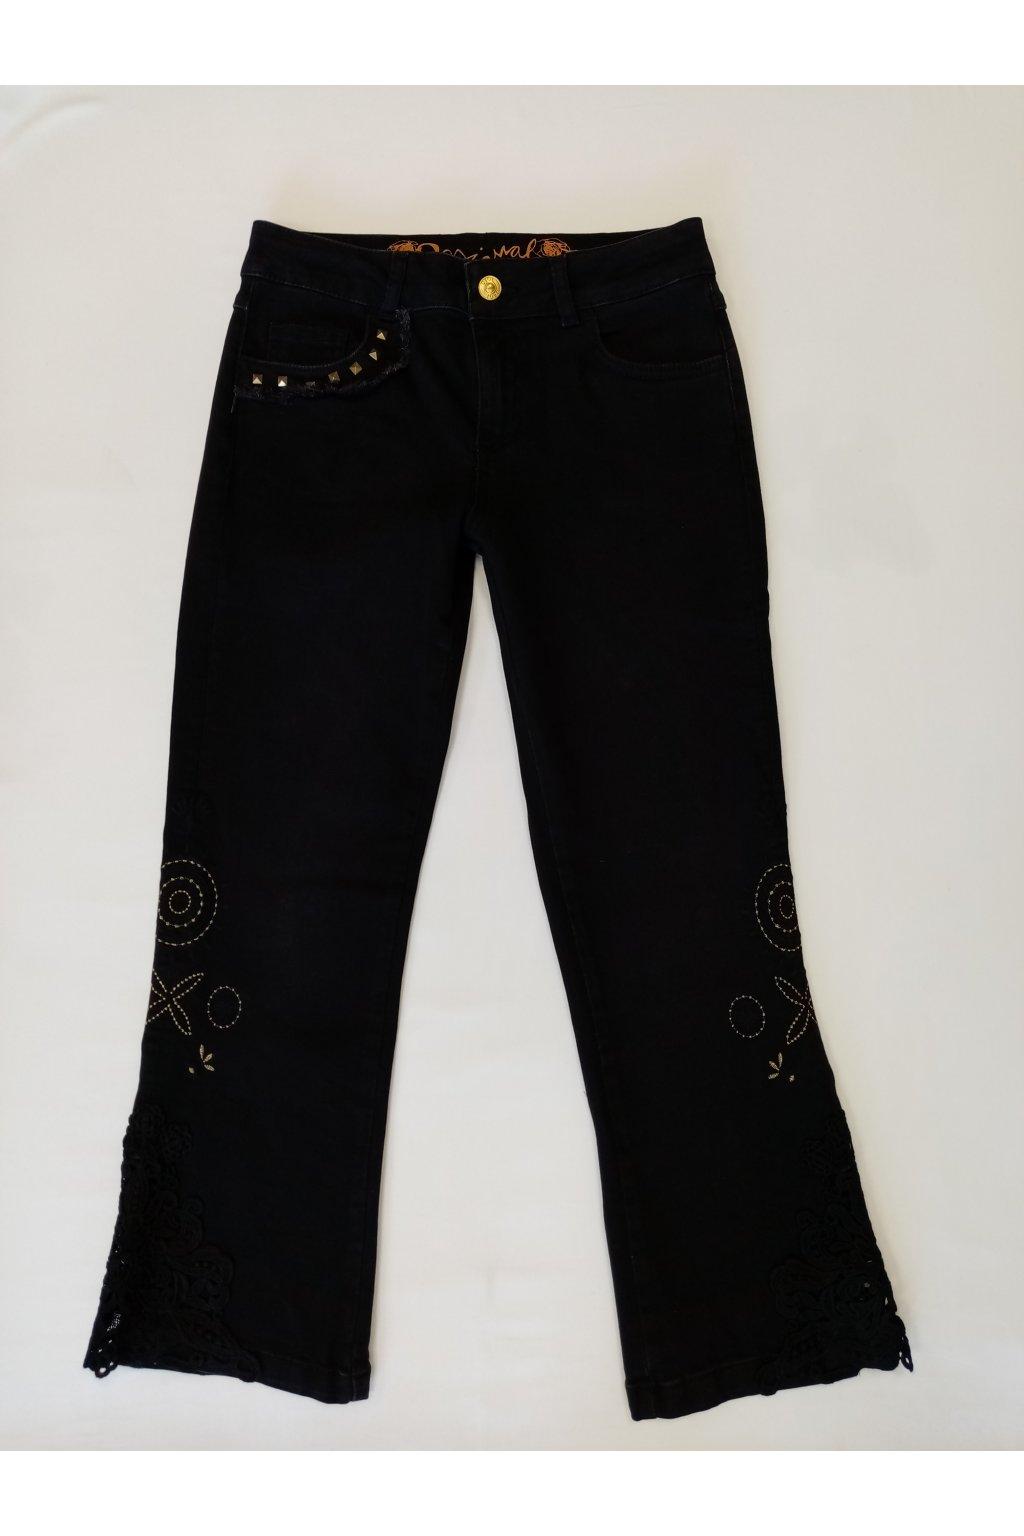 Kalhoty Desigual 18SWDD47/5162